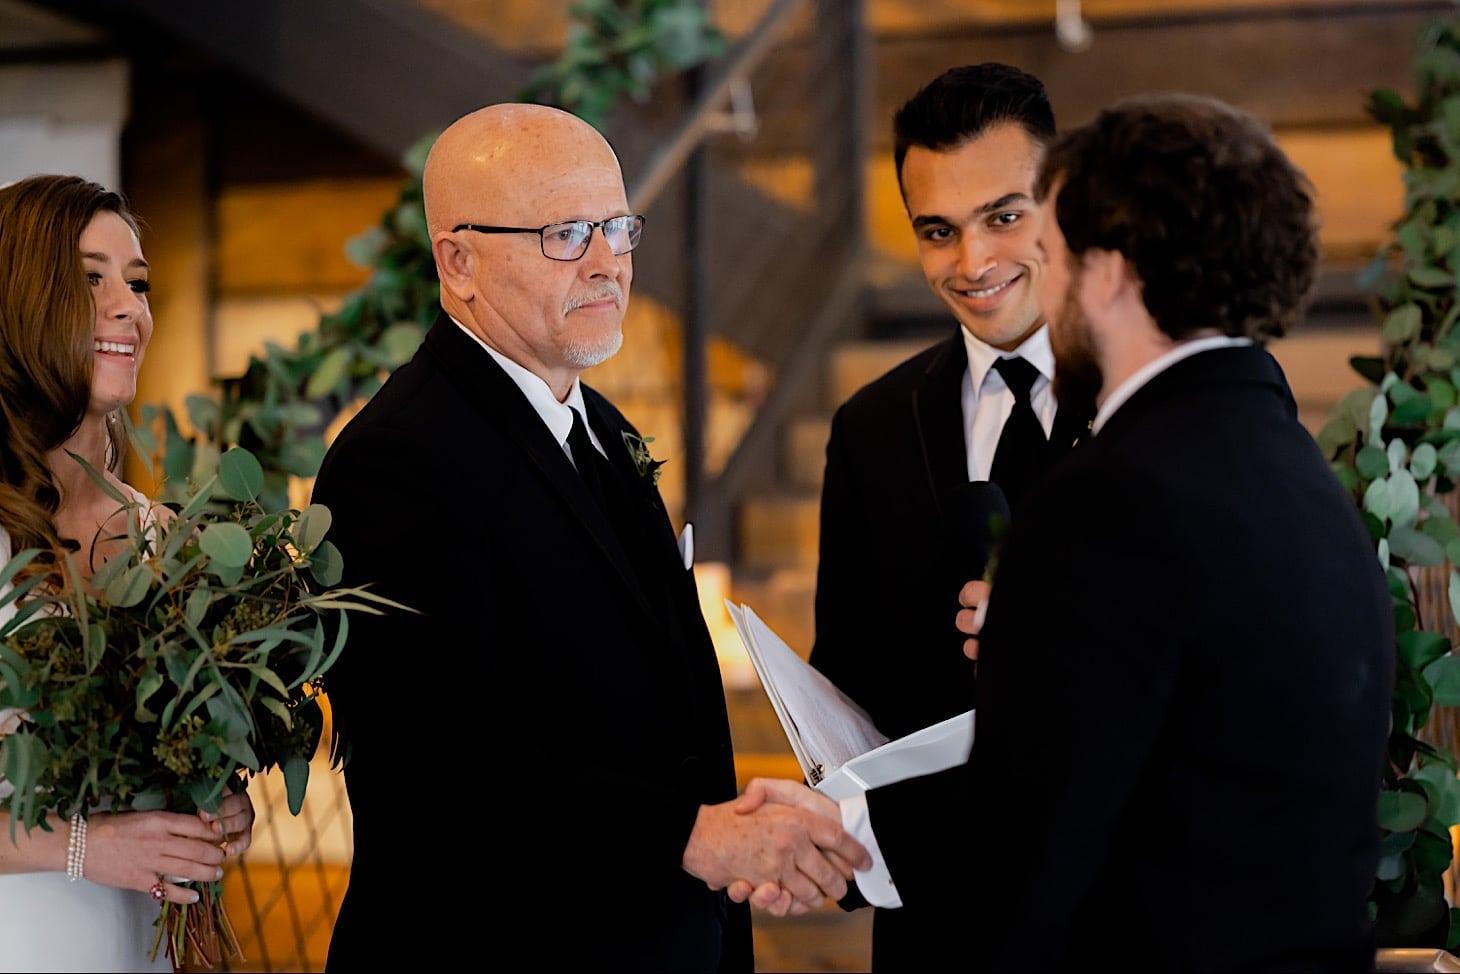 wedding ceremony at River Center